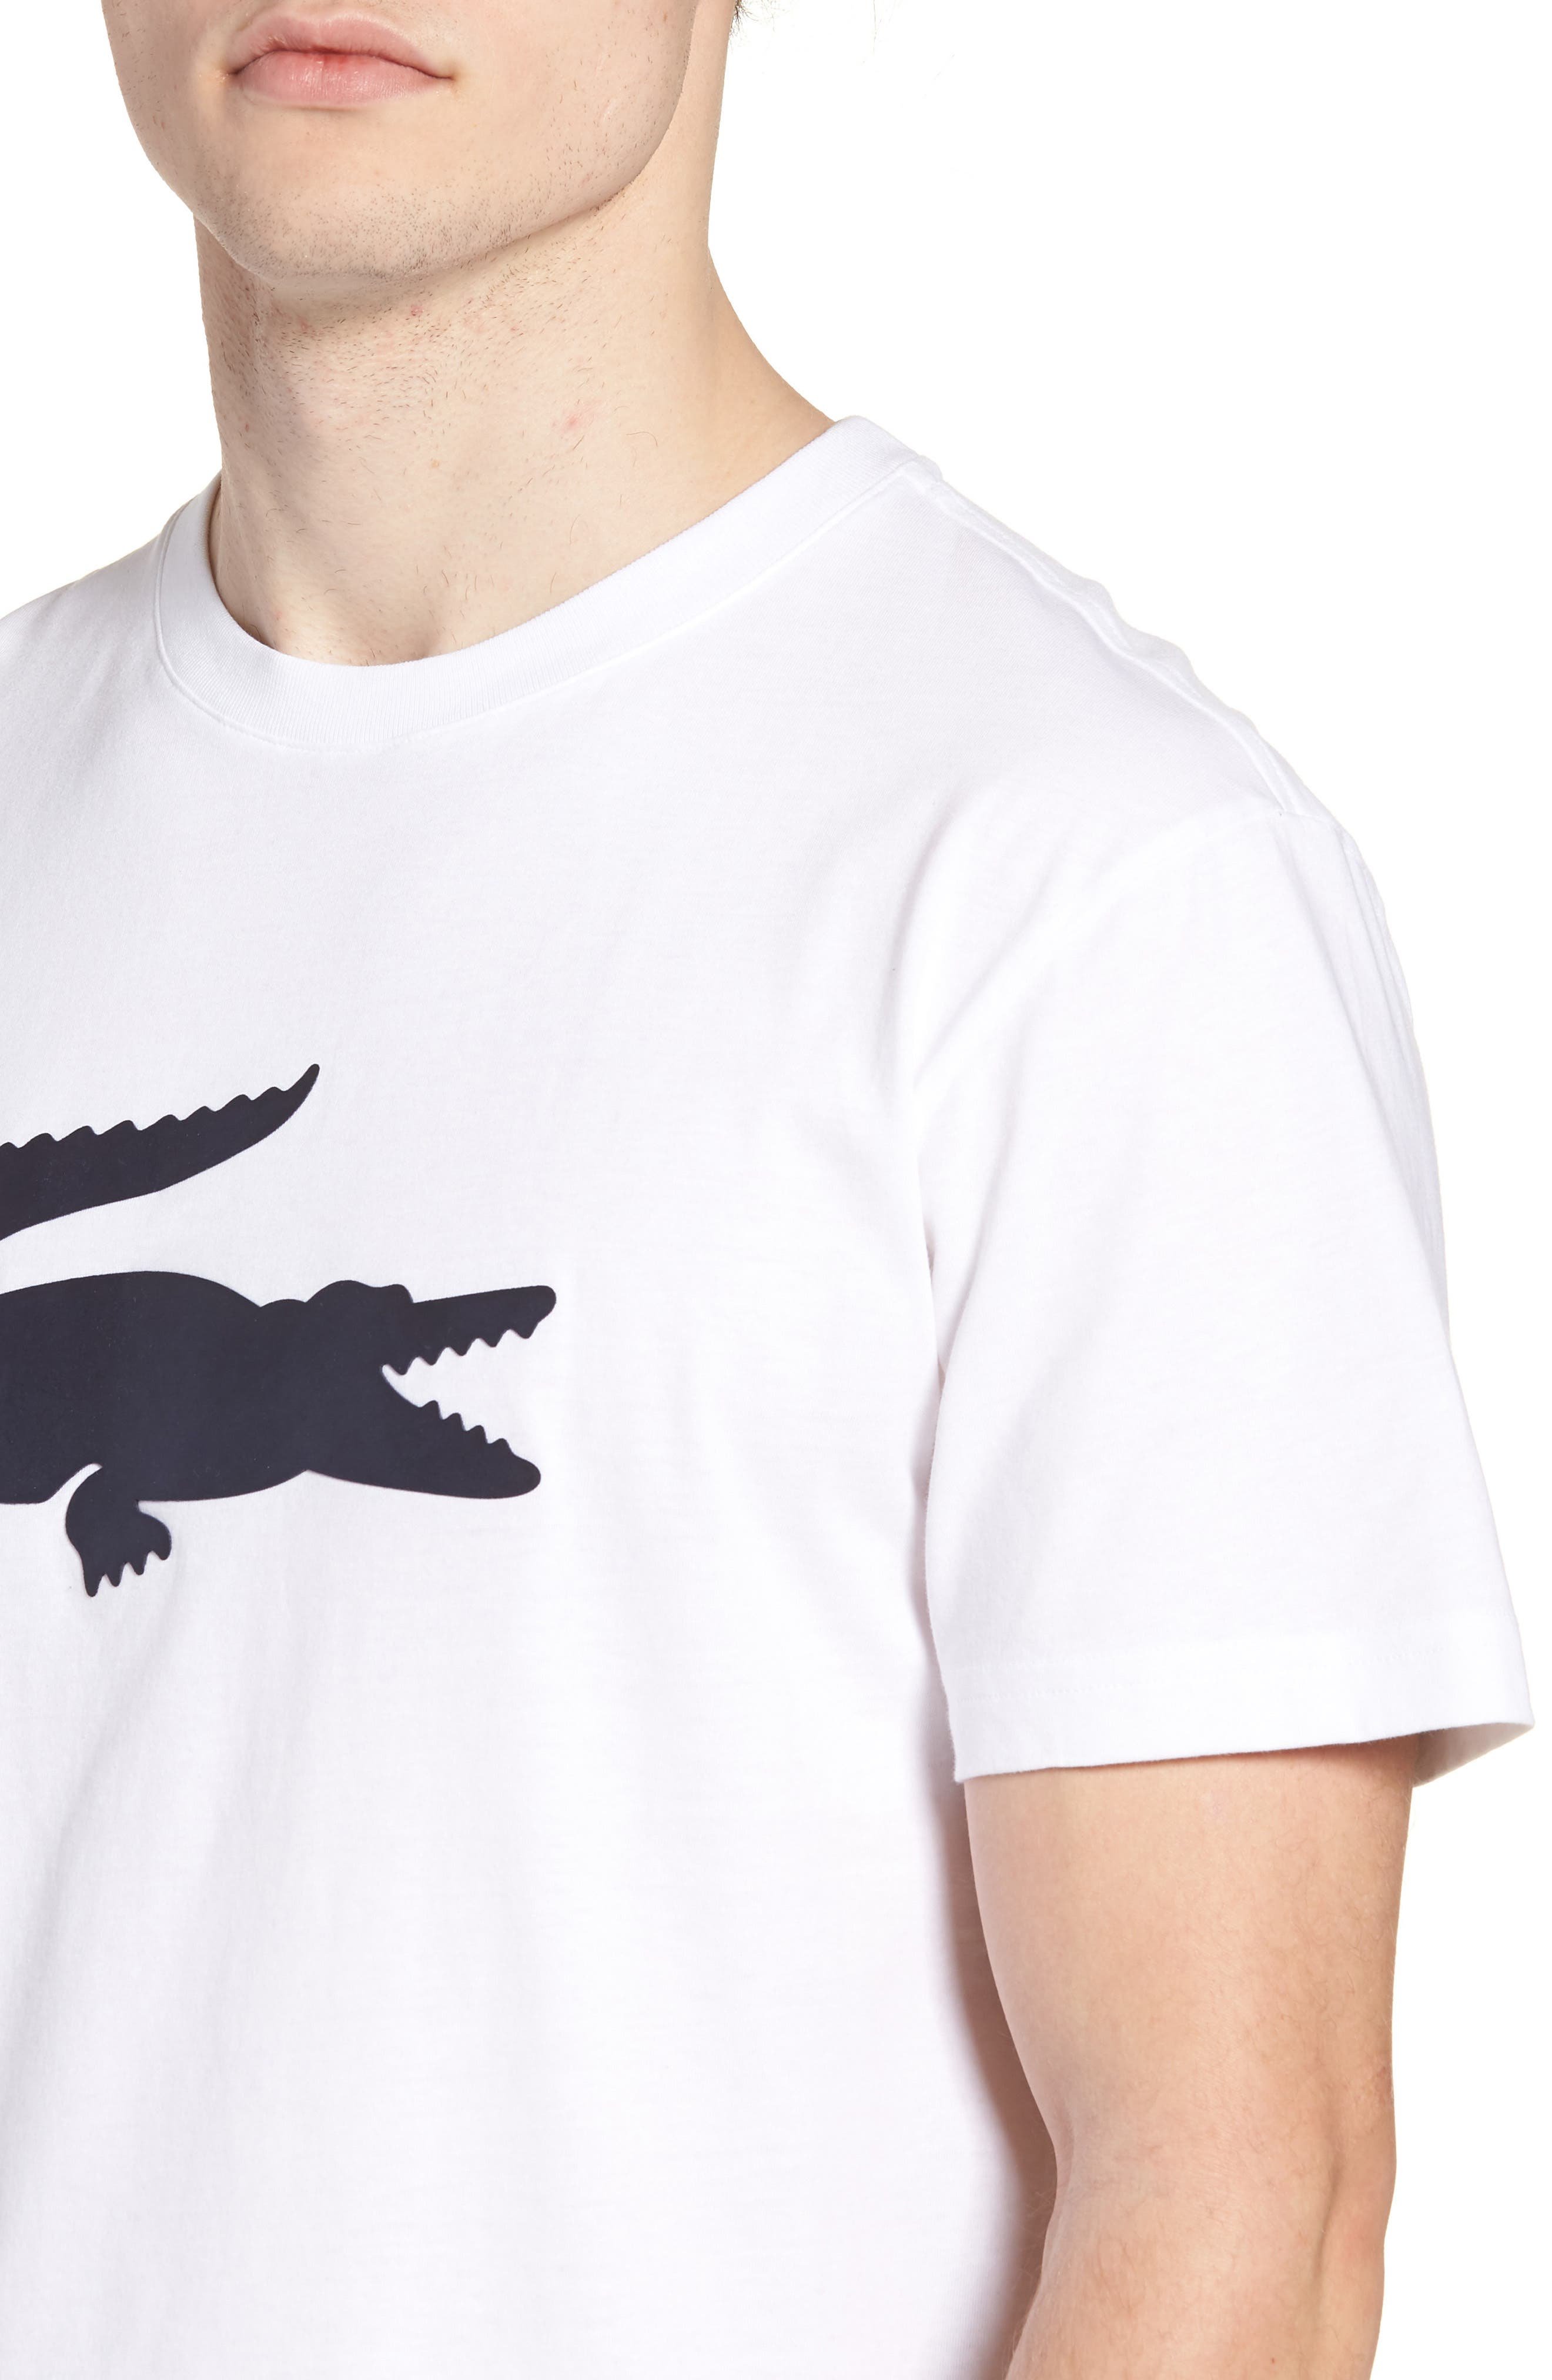 Crocodile T-Shirt,                             Alternate thumbnail 4, color,                             WHITE/ NAVY BLUE